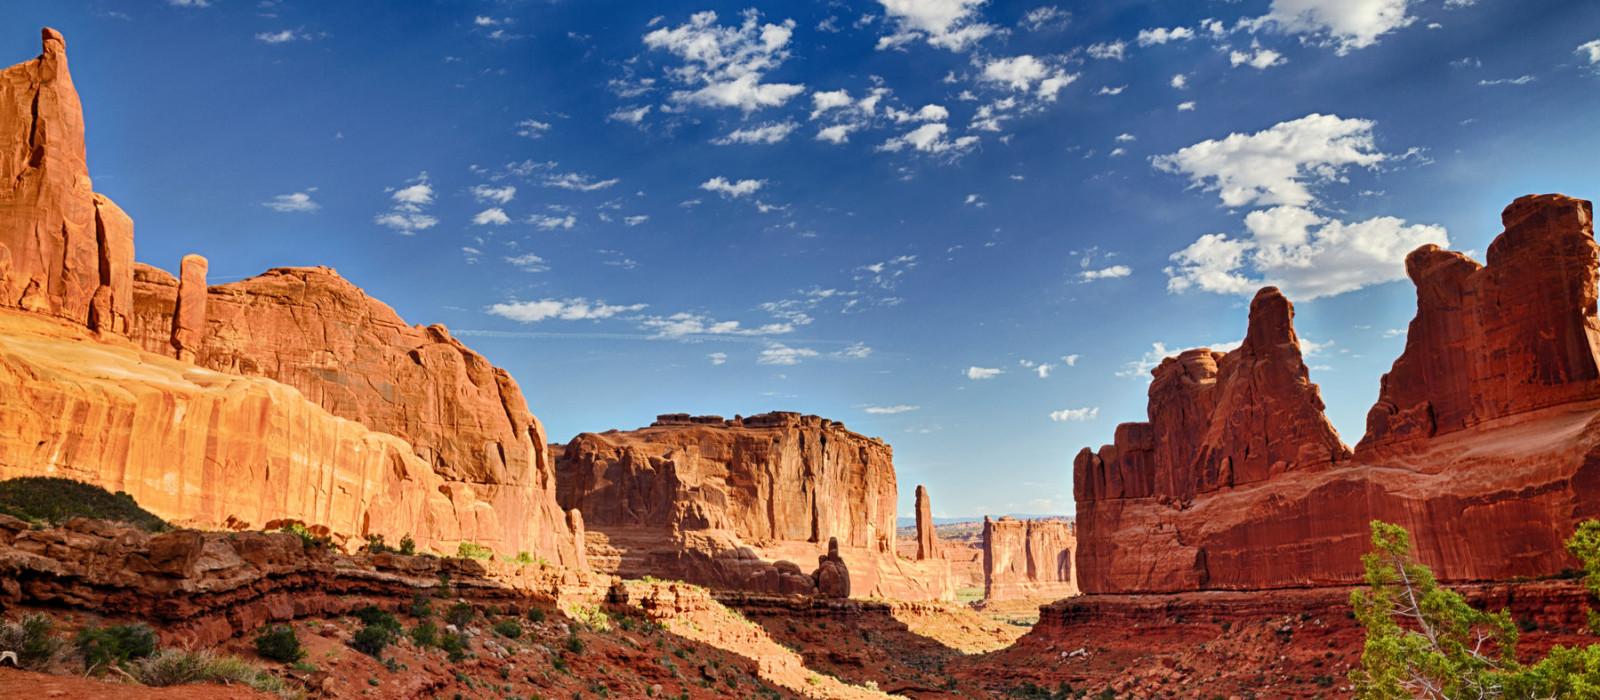 USA Roadtrip – Utahs Nationalparks & Grand Canyon Urlaub 1